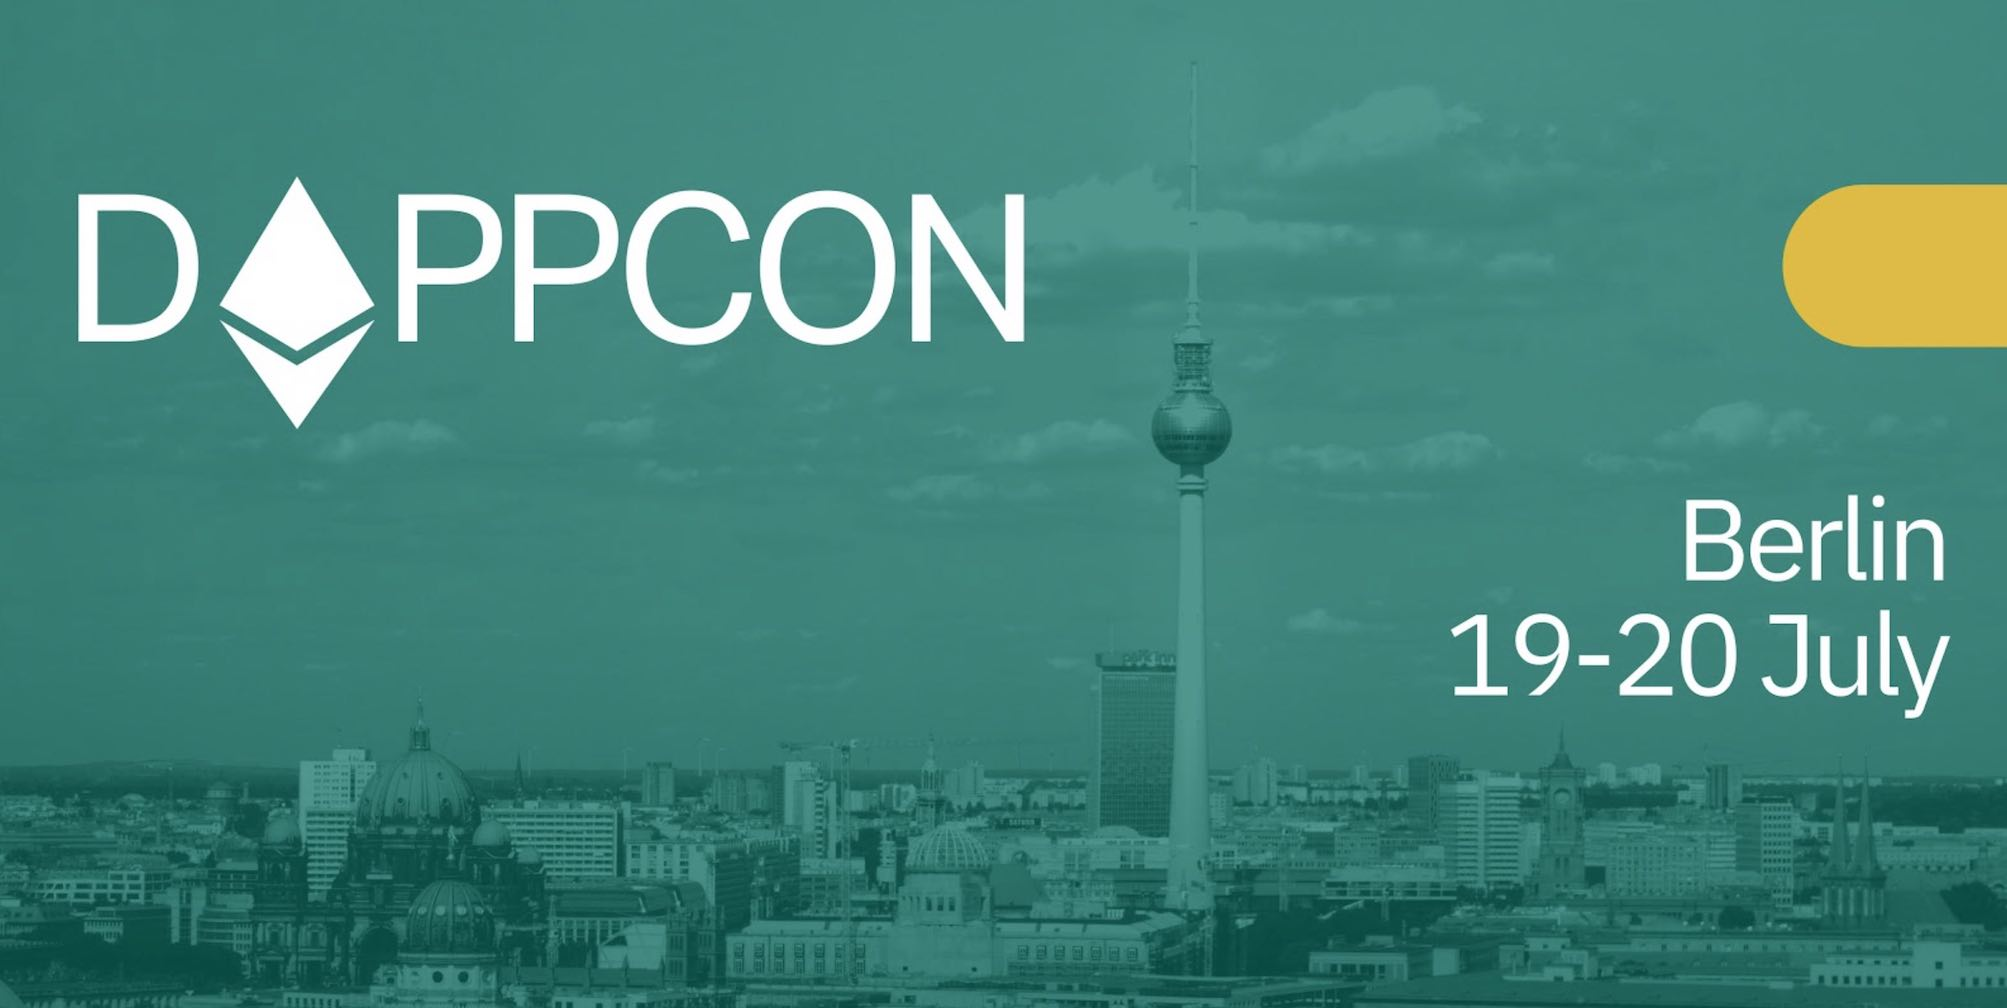 DappCon Berlin organized by Gnosis